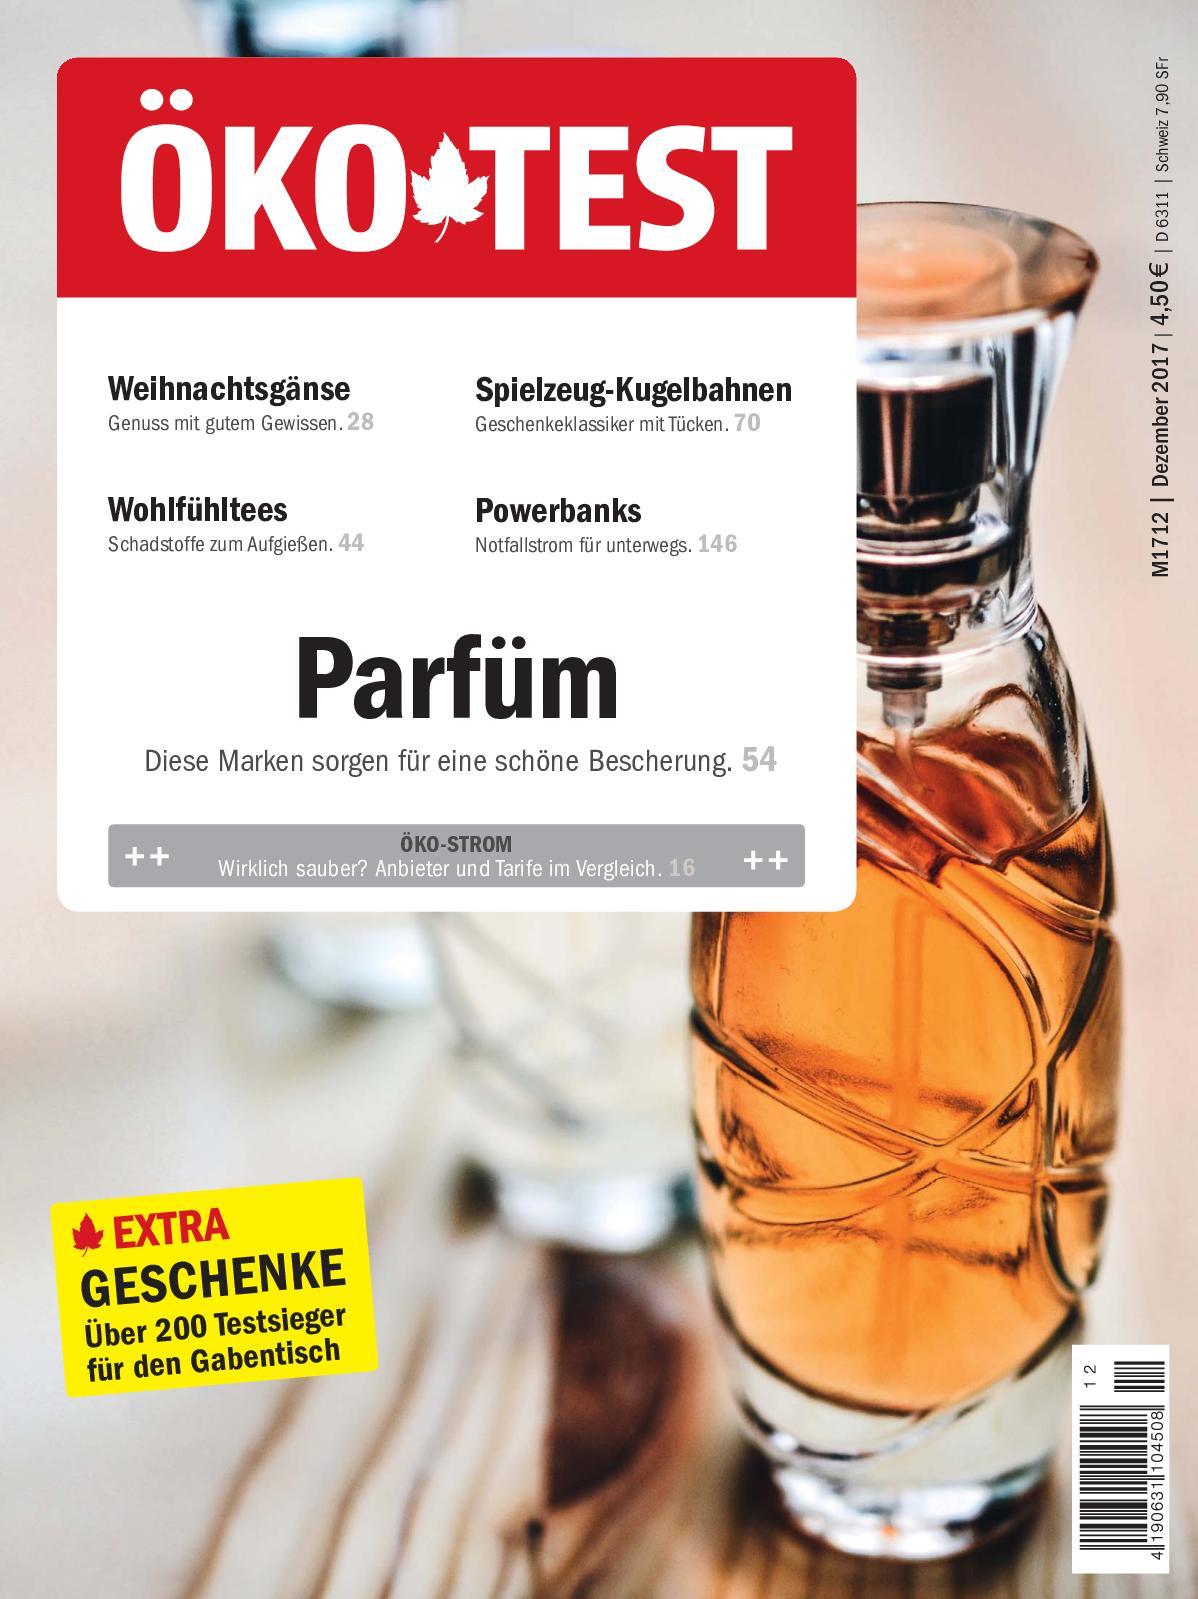 Nagellack Regal Parfüm Regal Großen Kapazität Aromatischer Geschmack Zeigen